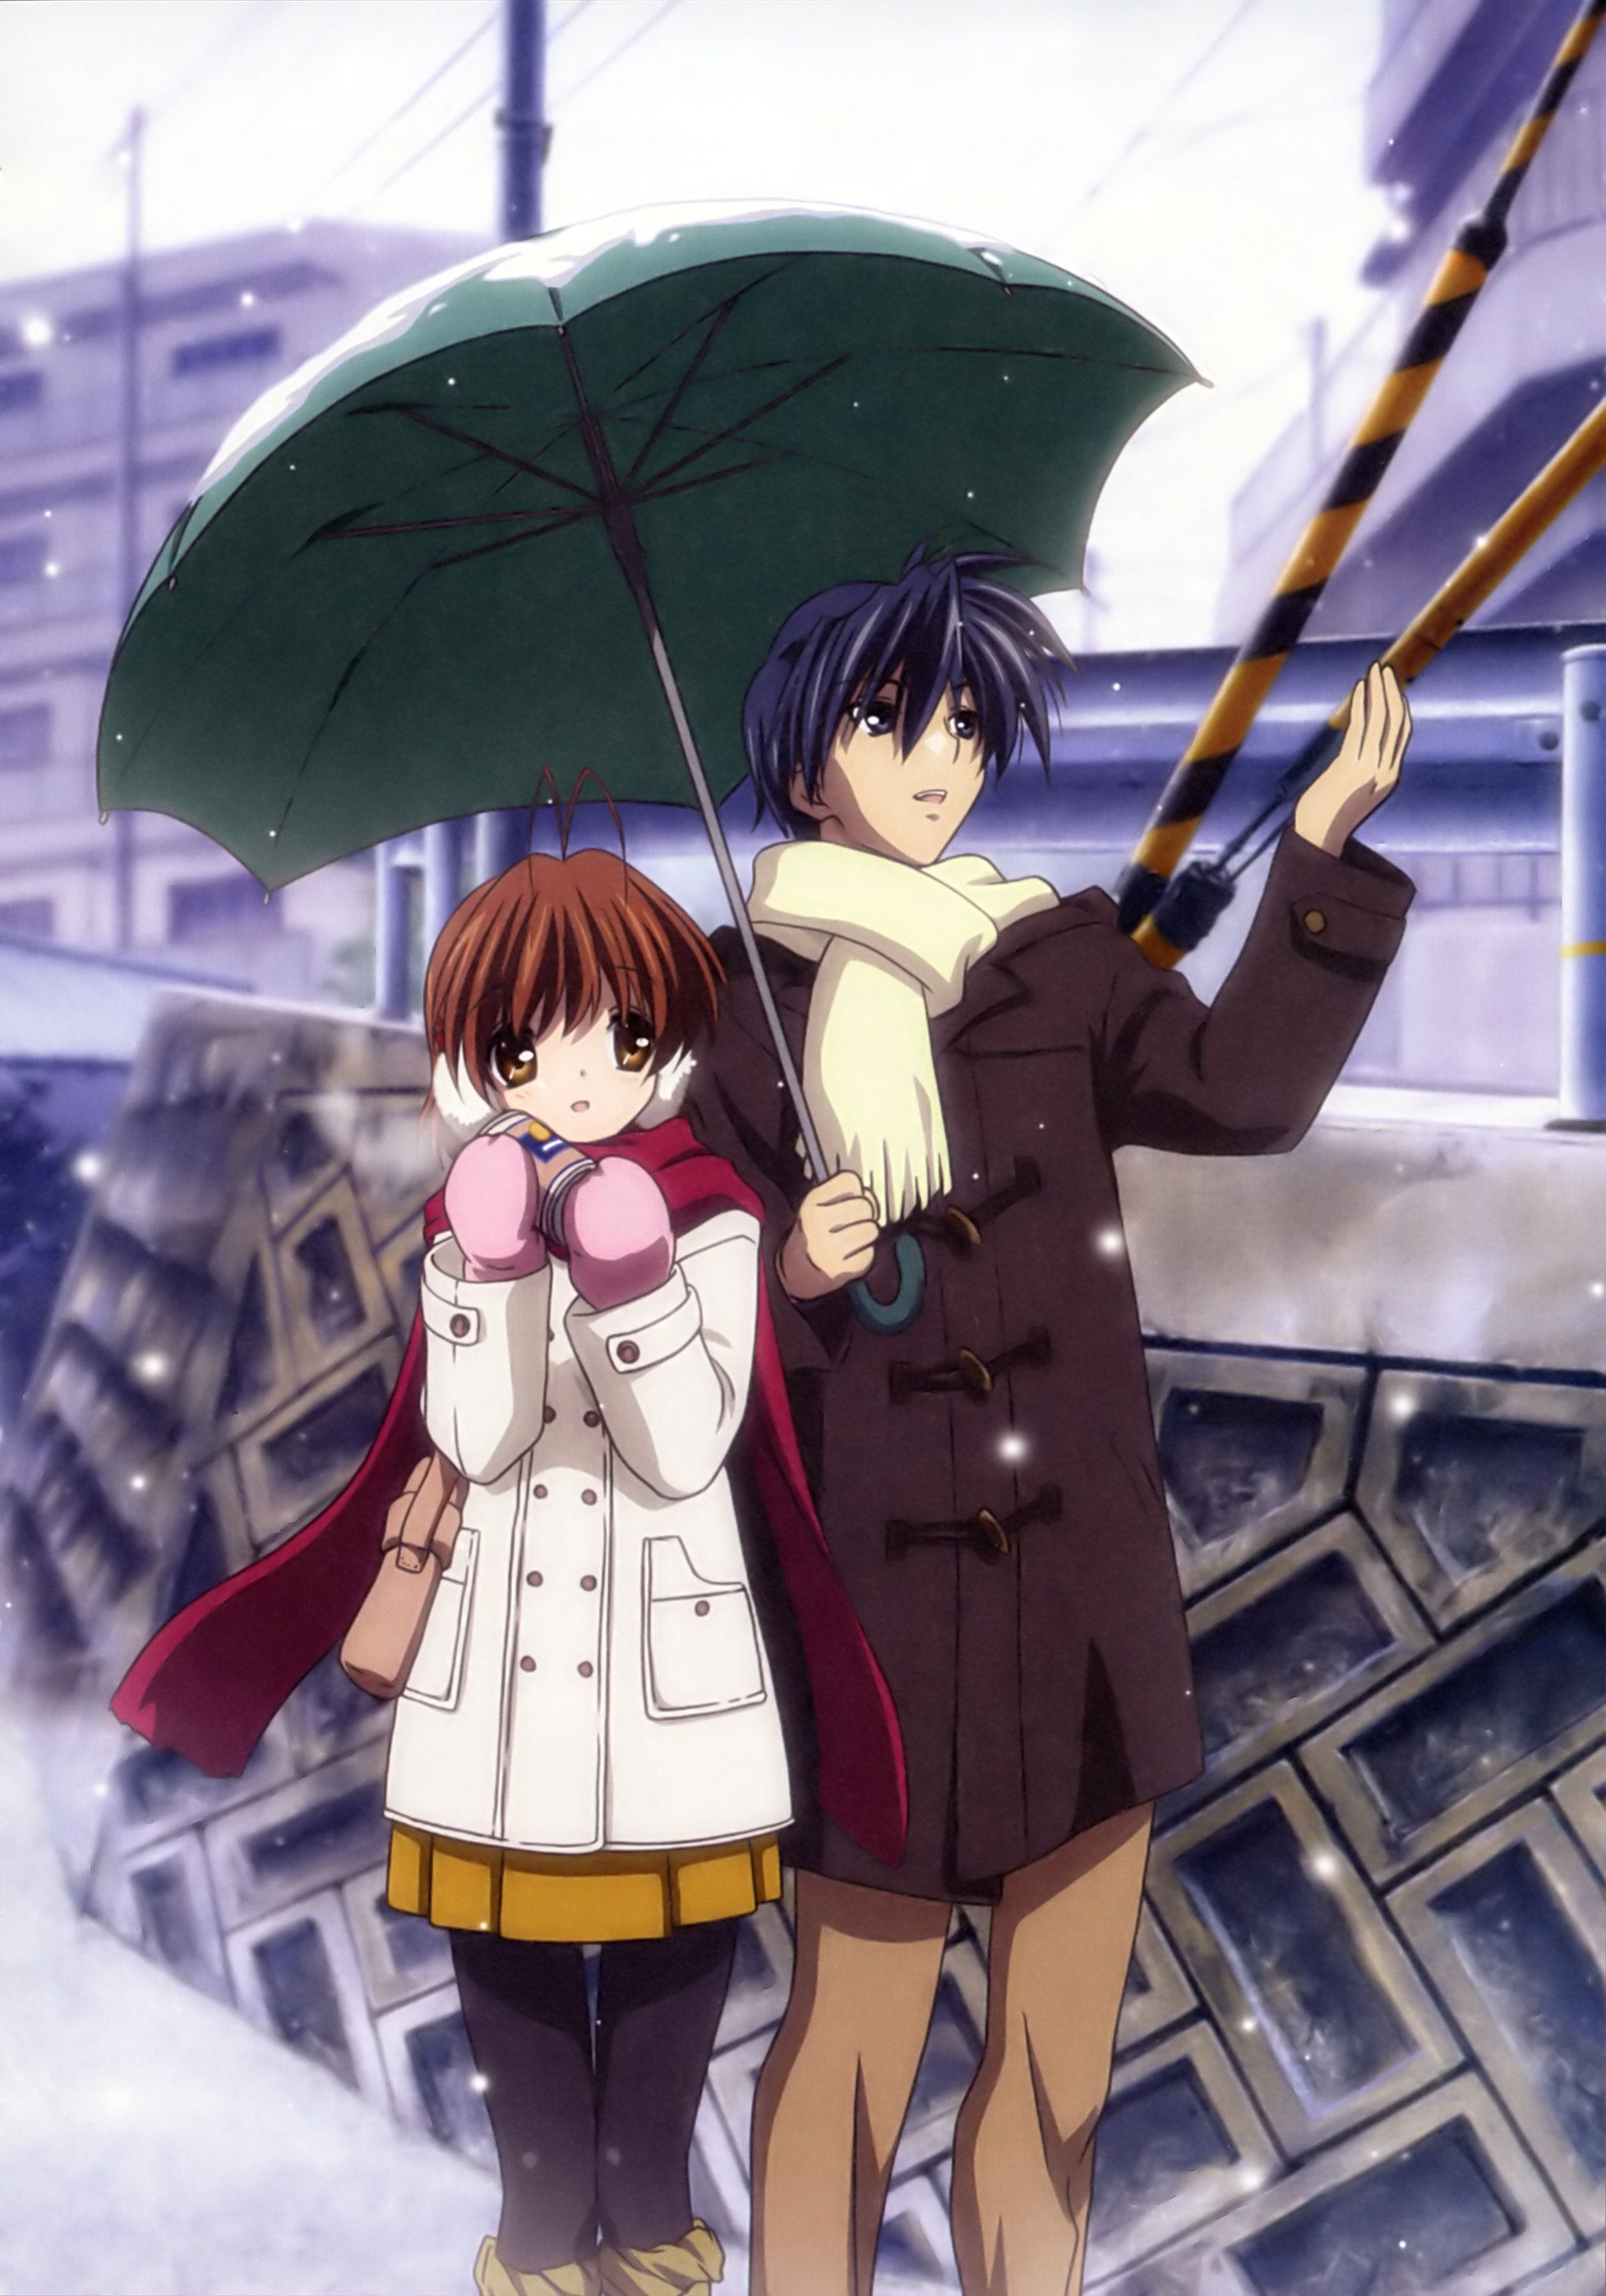 Anime Kage Com Clannad Clannad Anime Clannad After Story